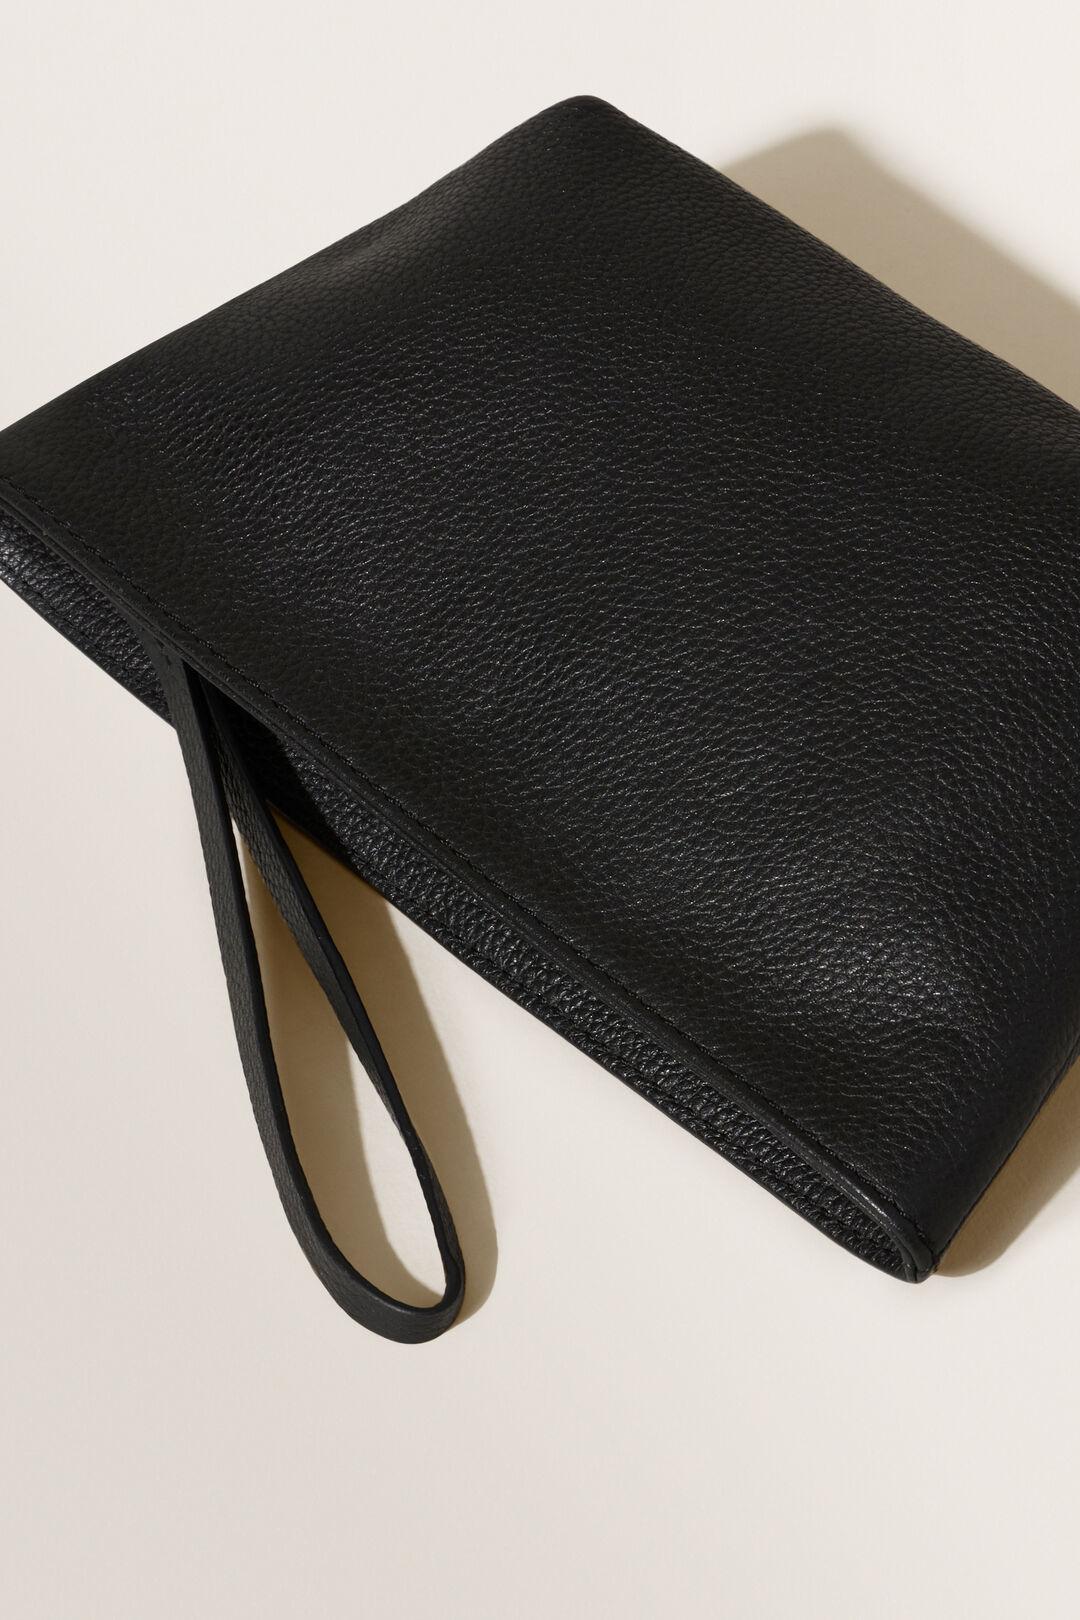 Leather Fold Detail Pouch  BLACK  hi-res